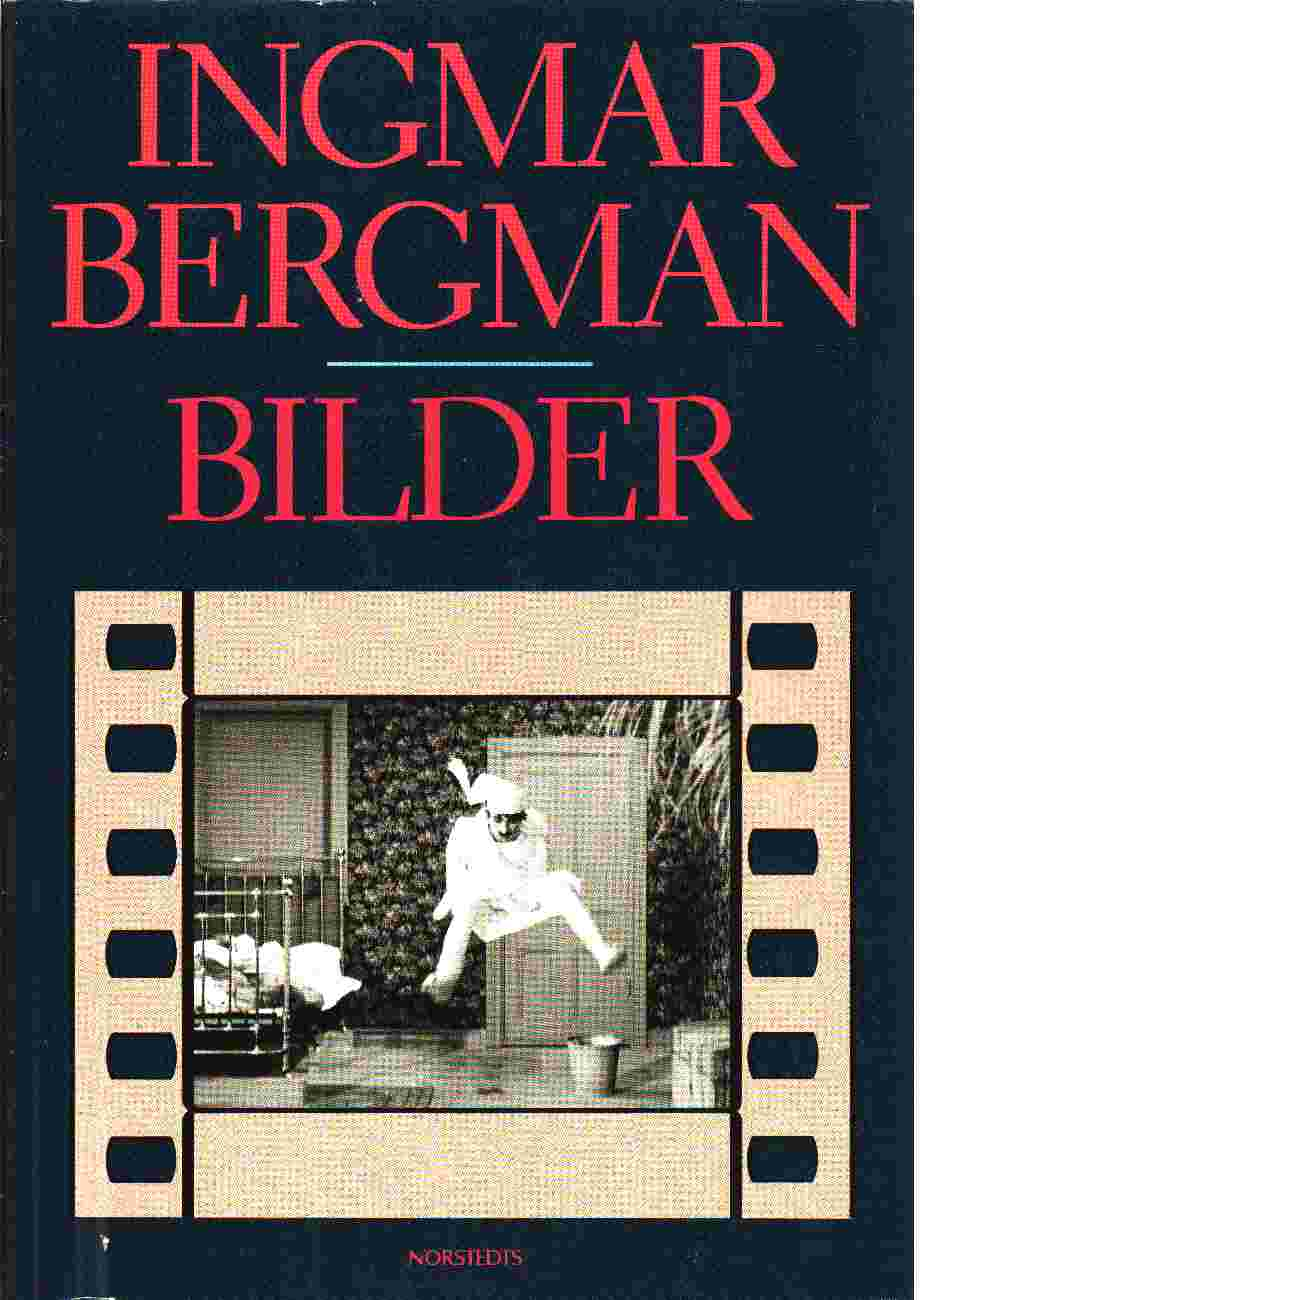 Bilder / Ingmar Bergman / Ingmar Bergman - Bergman, Ingmar